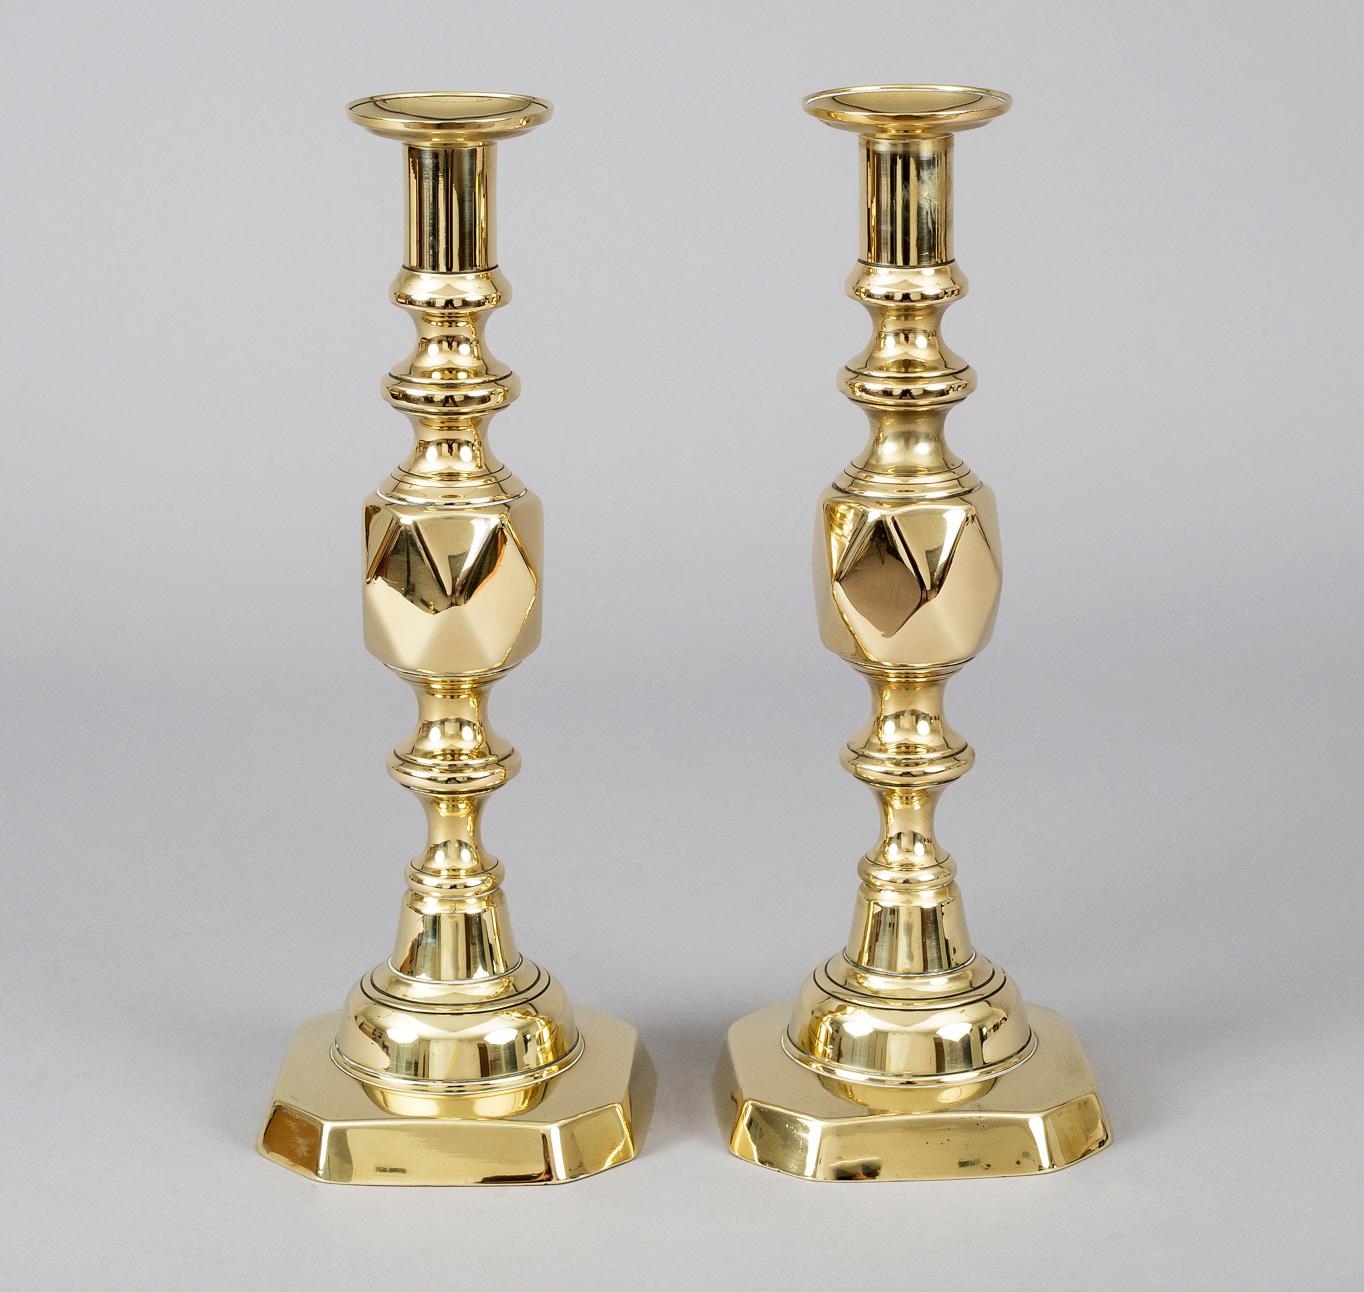 Antique Pair Victorian Brass Quot King Of Diamonds Quot Candlesticks